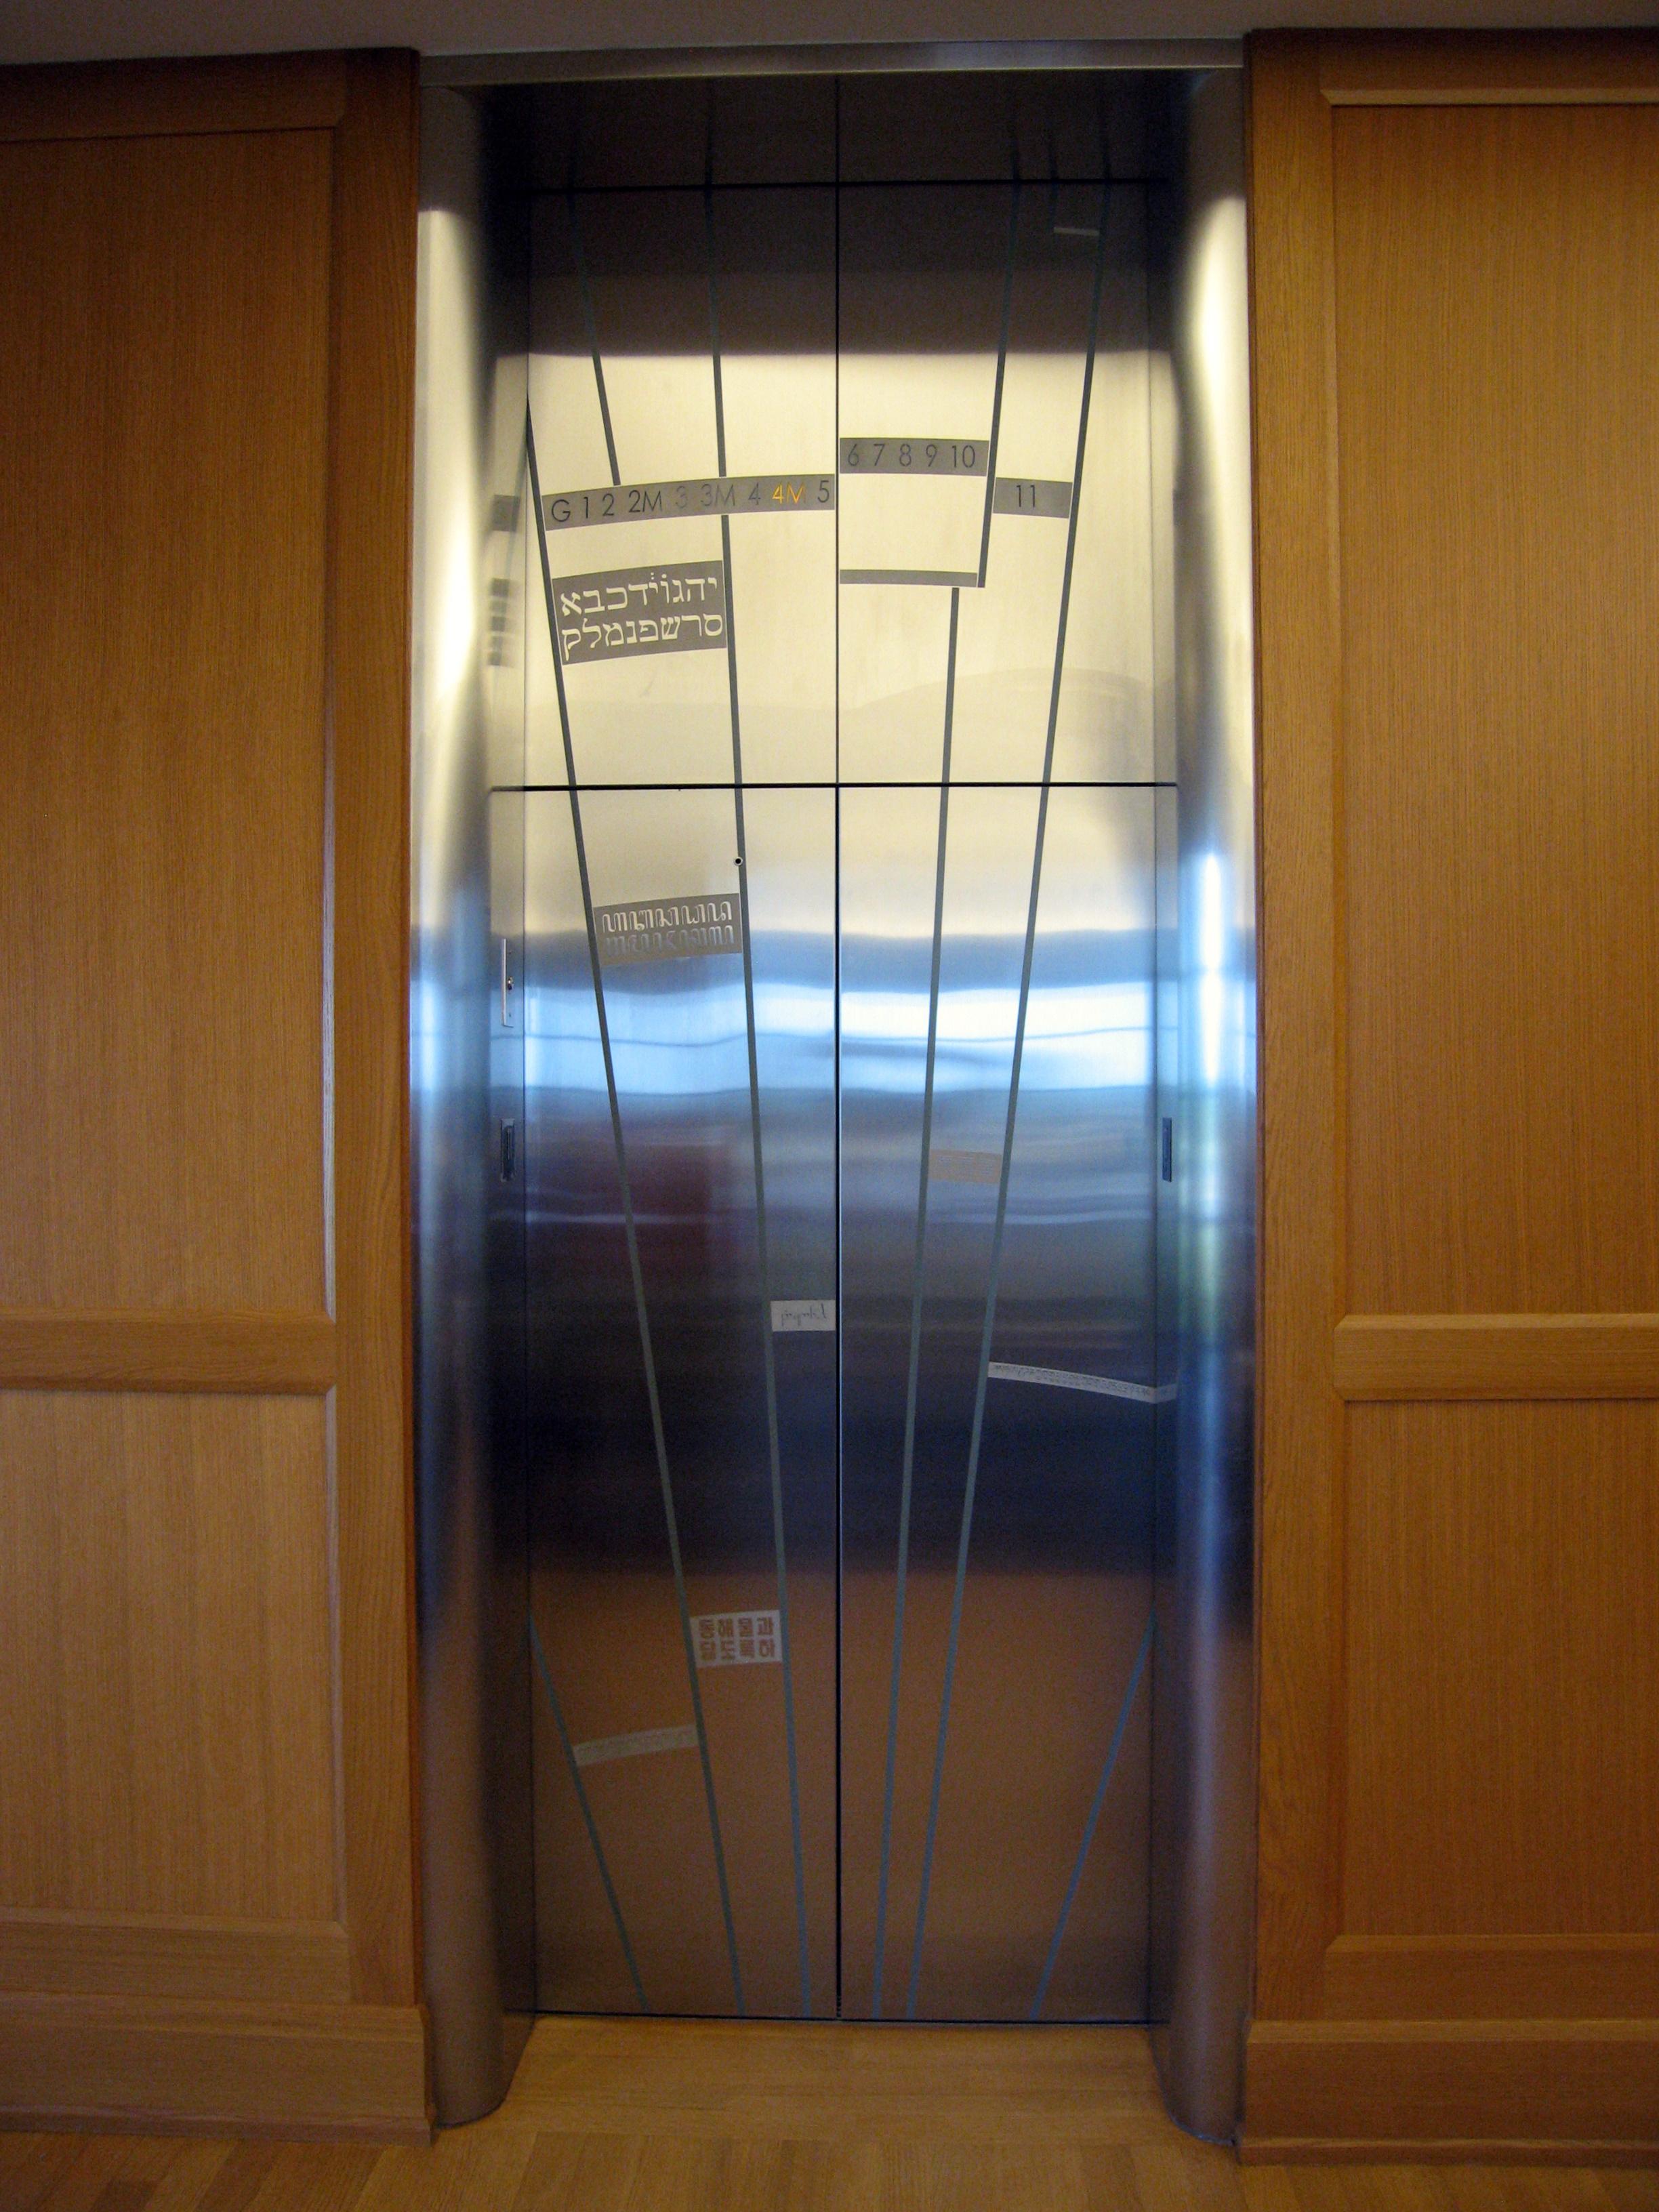 FileOSU Thompson Library - elevator doors.jpg & File:OSU Thompson Library - elevator doors.jpg - Wikimedia Commons pezcame.com